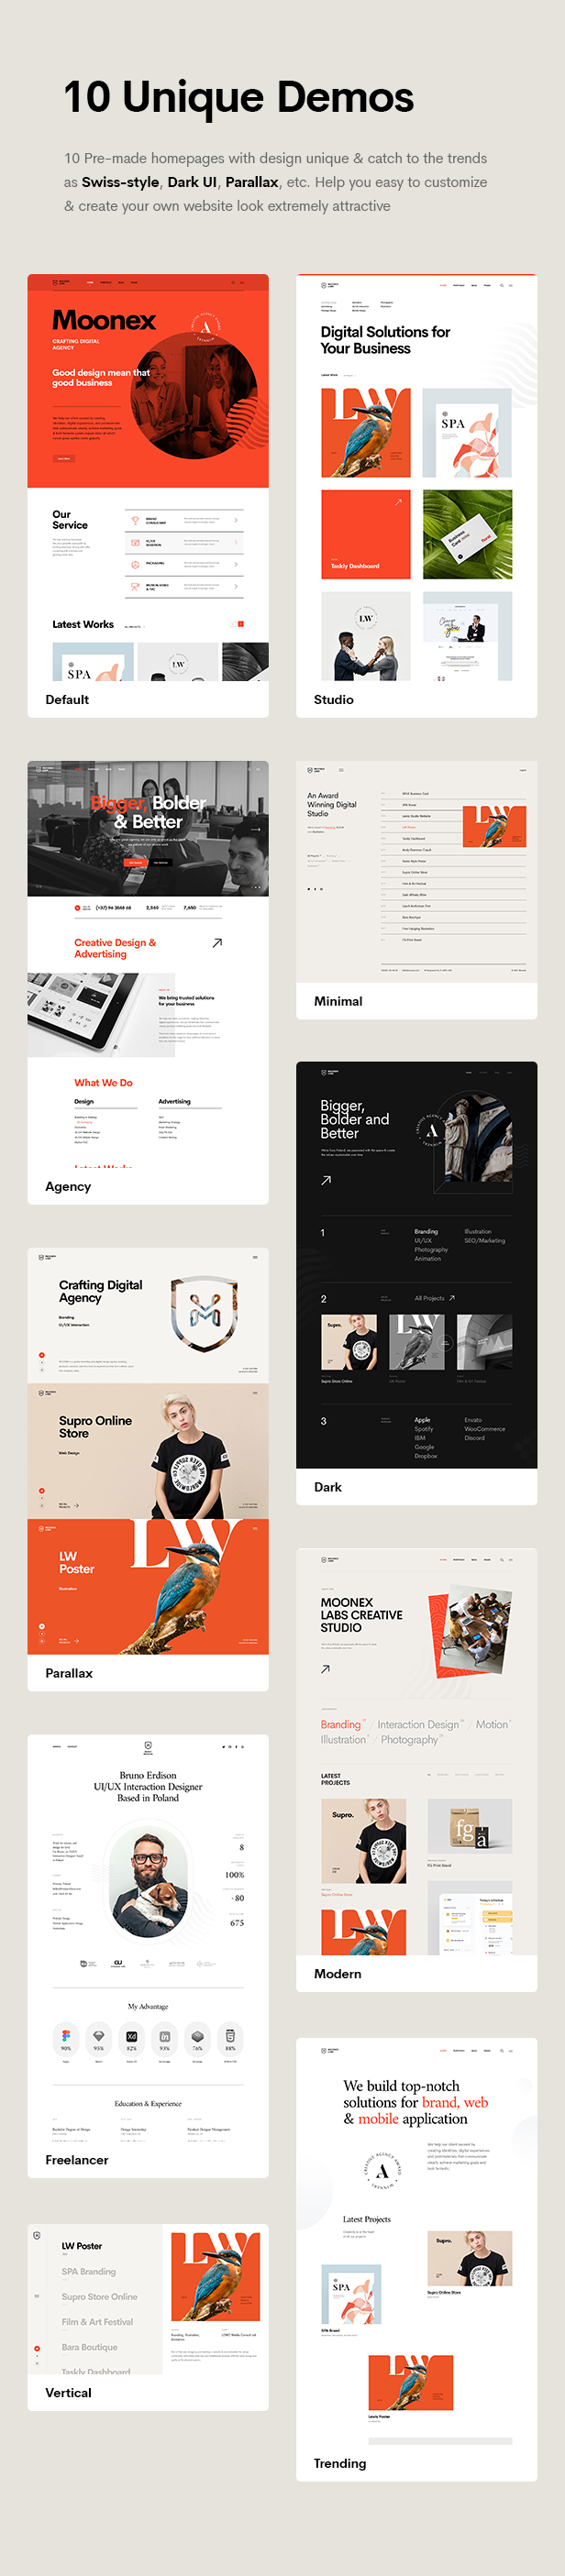 Moonex - Agency & Portfolio WordPress Theme - 5